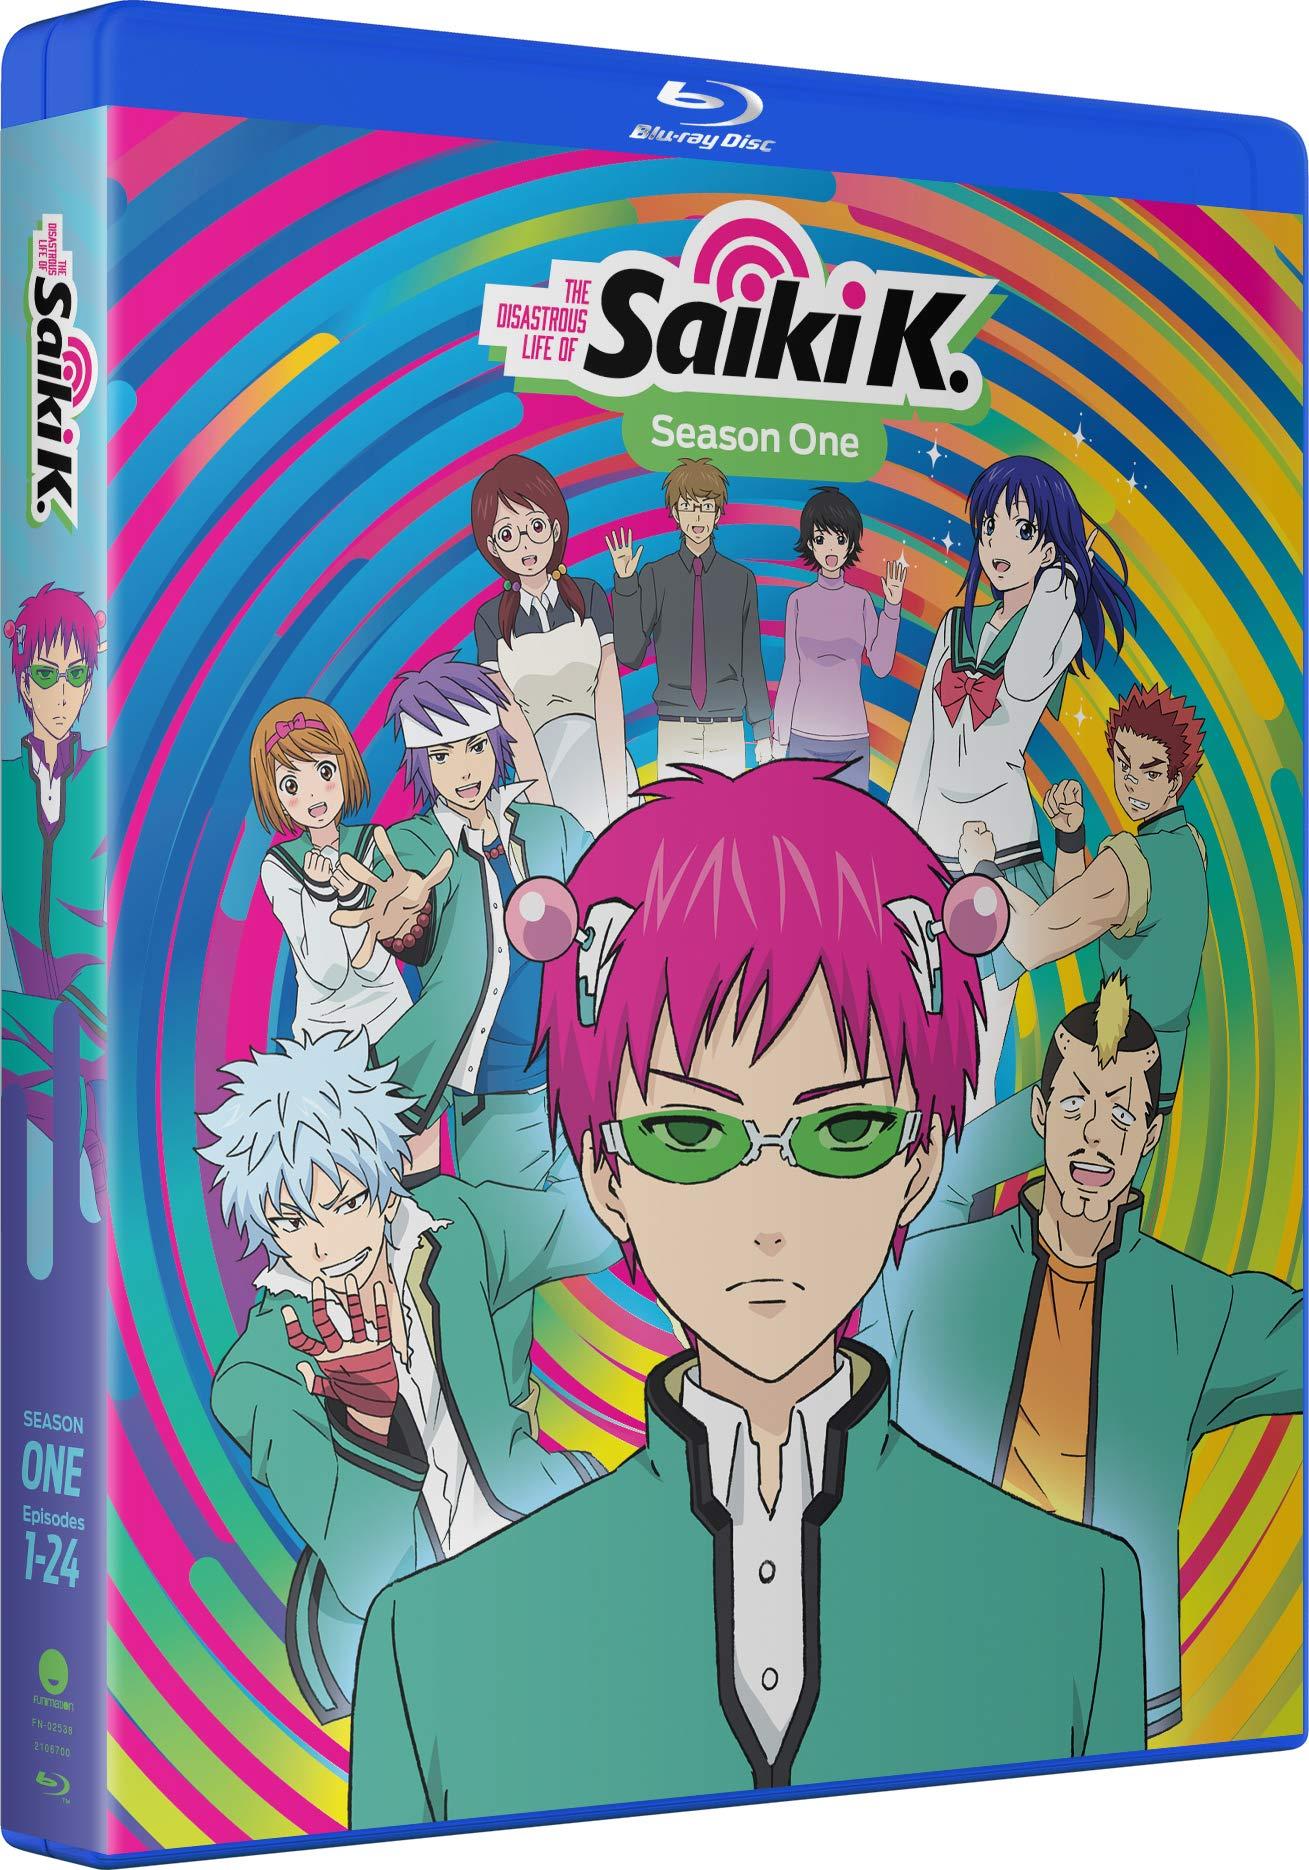 Blu-ray : The Disastrous Life Of Saiki K.: Season One (Standard Edition, Boxed Set, Snap Case, Slipsleeve Packaging, Digital Copy)